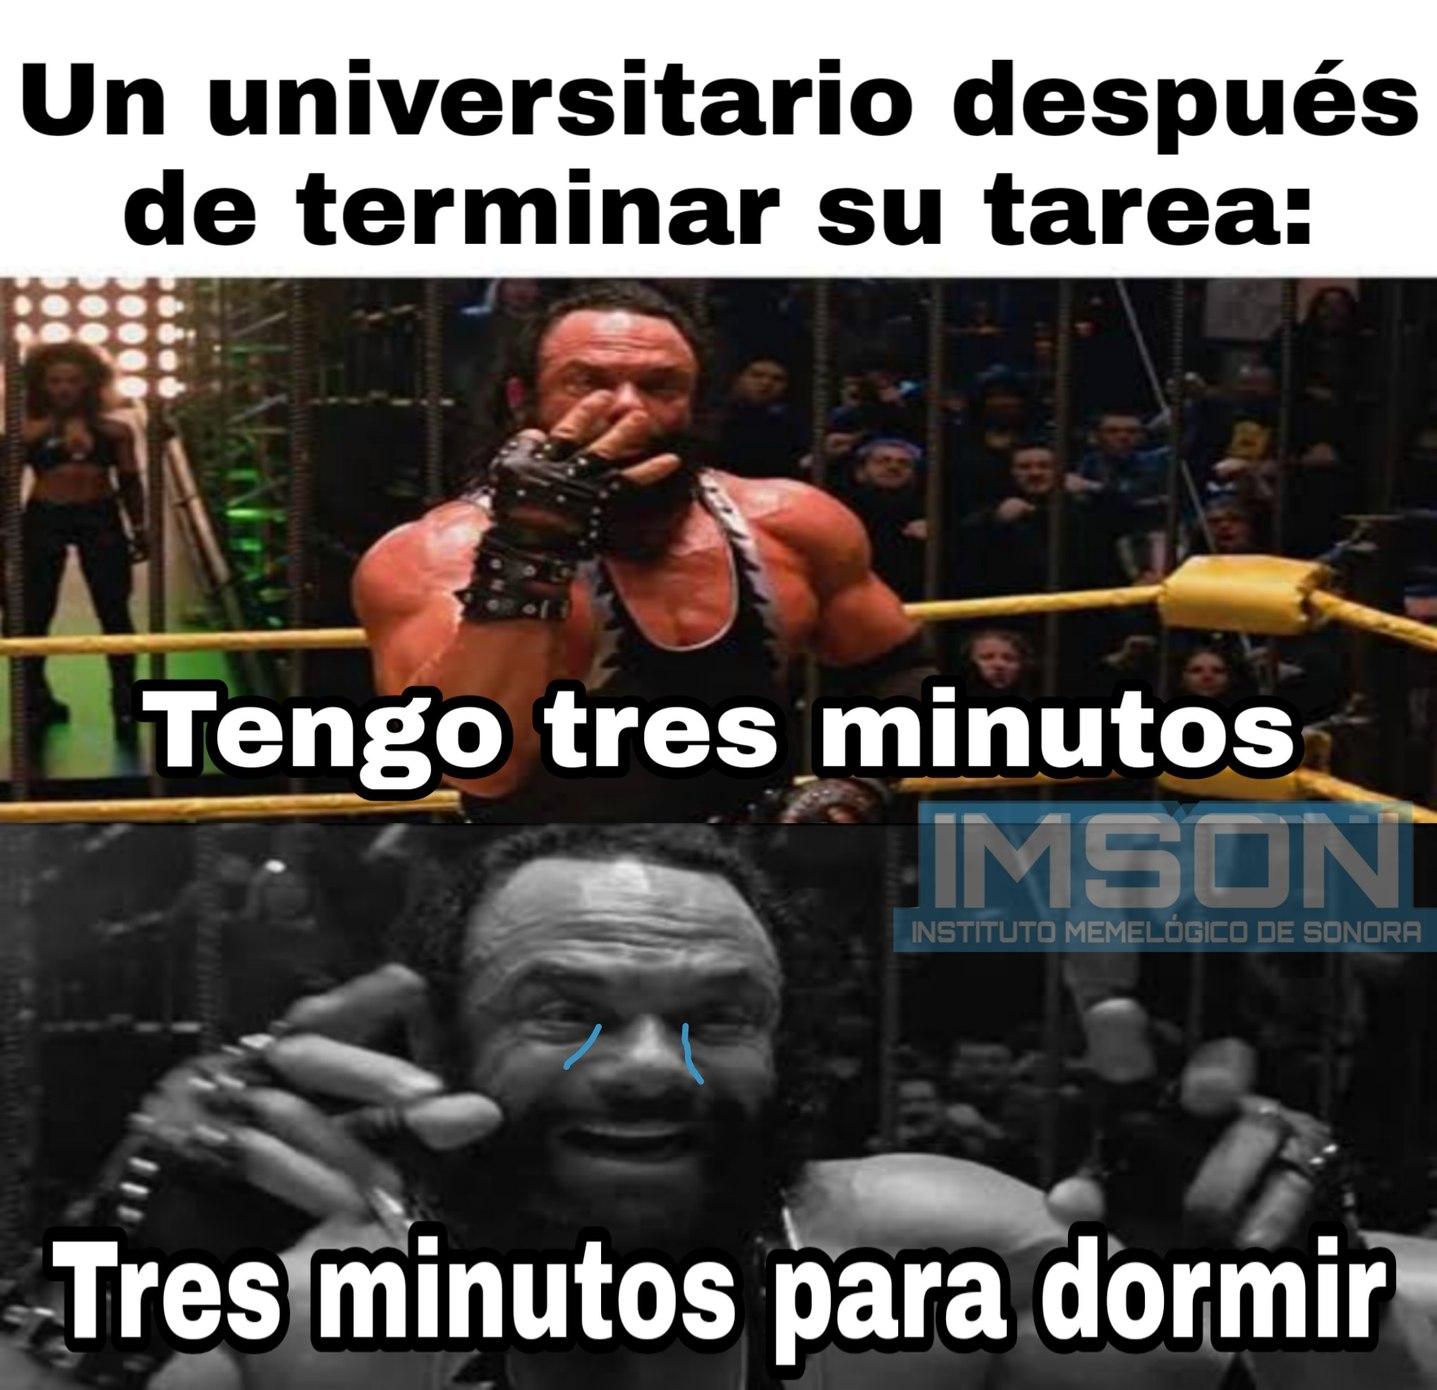 3 minutos - meme